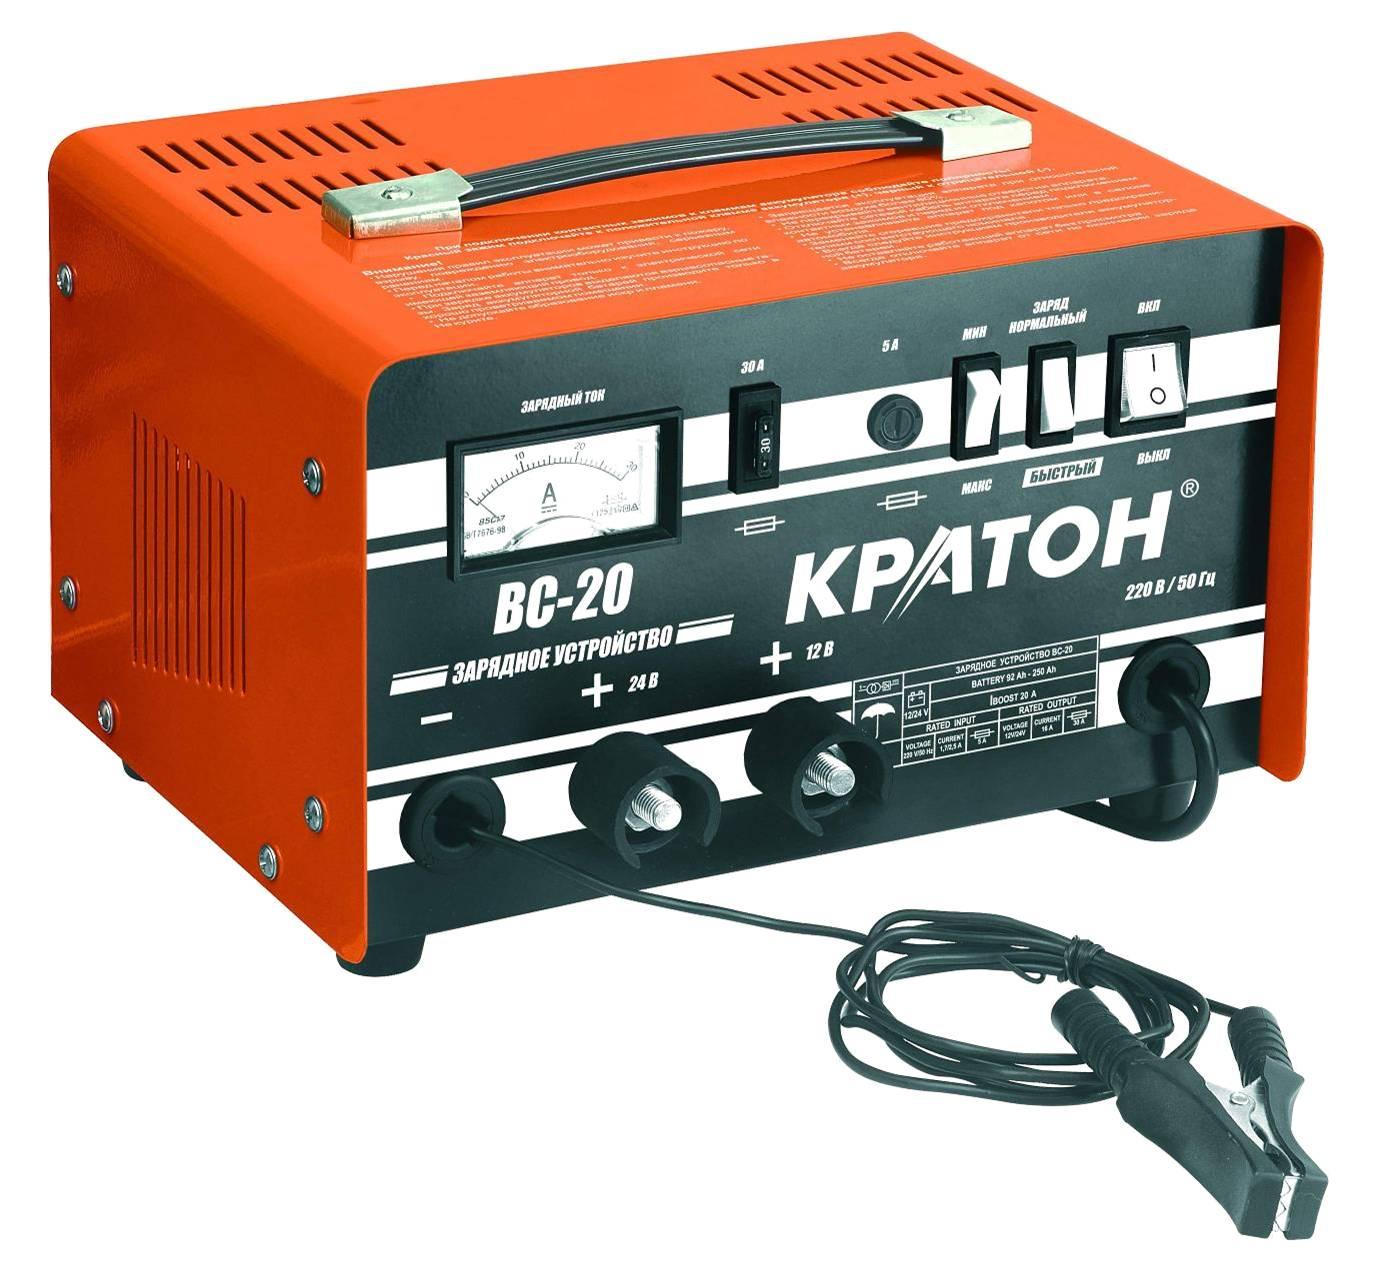 Зарядное устройство КРАТОН Bc-20 от 220 Вольт